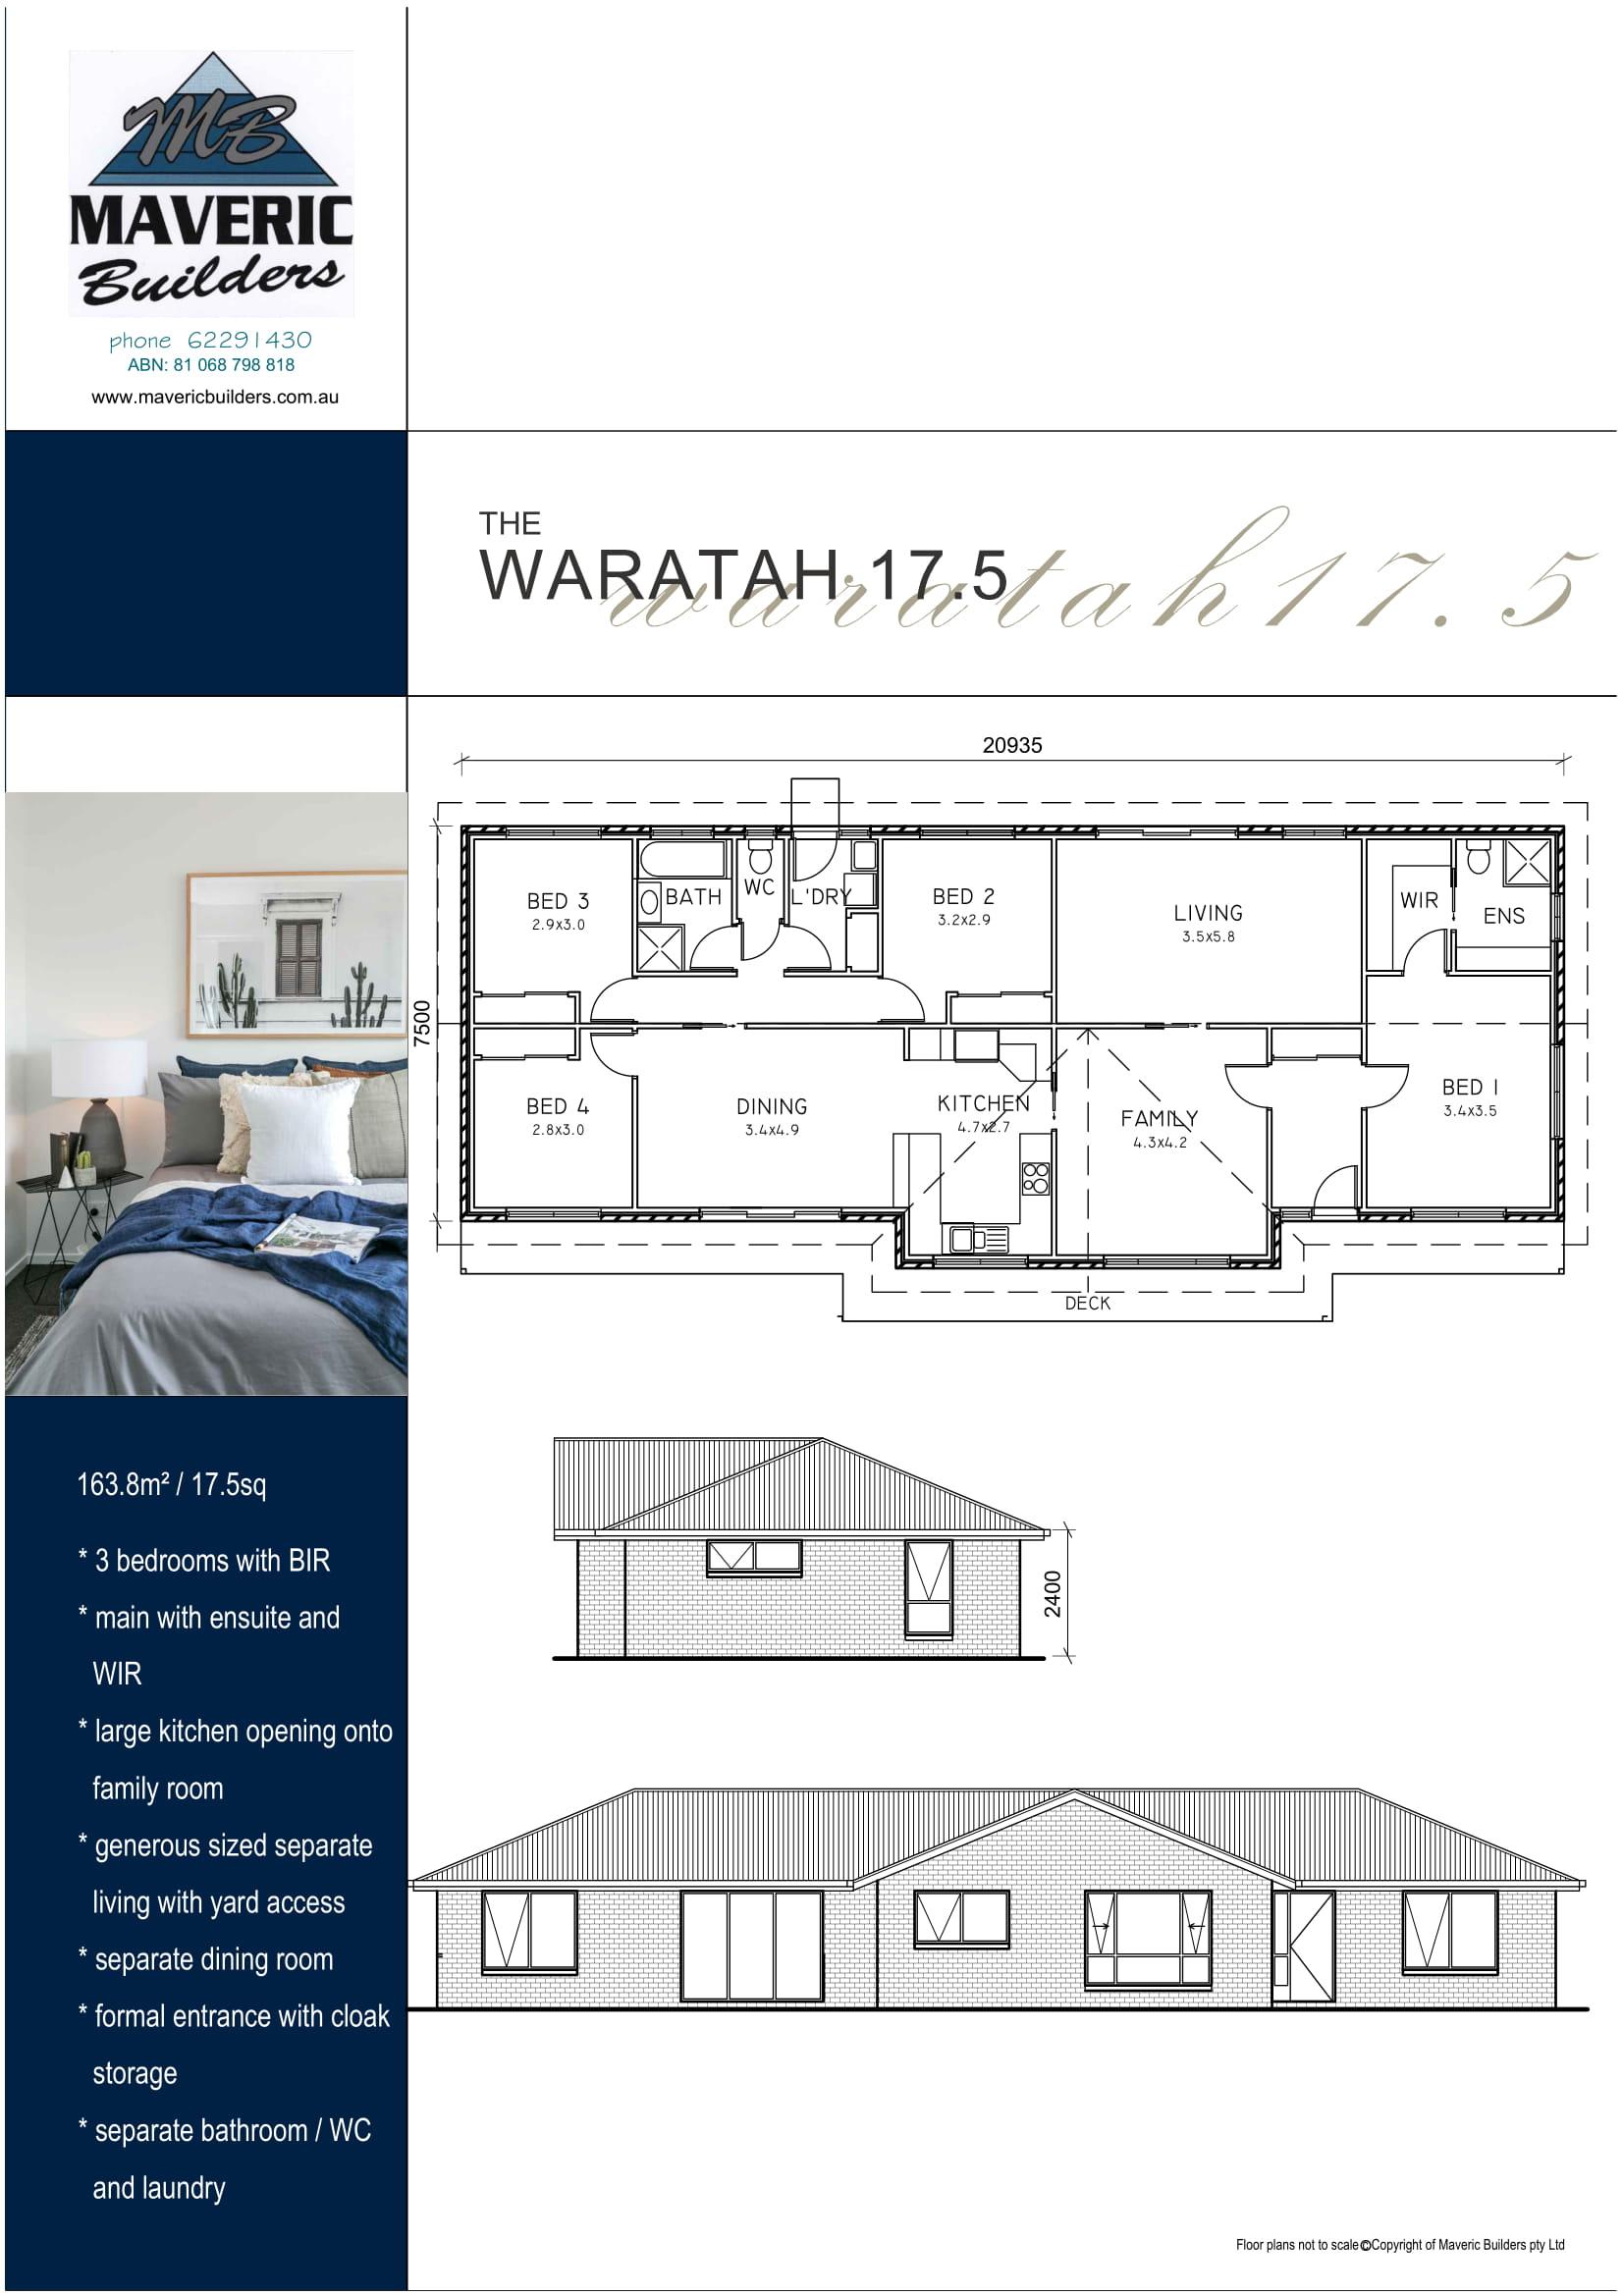 A4 Brochures 2019 01 - 24-15.jpg